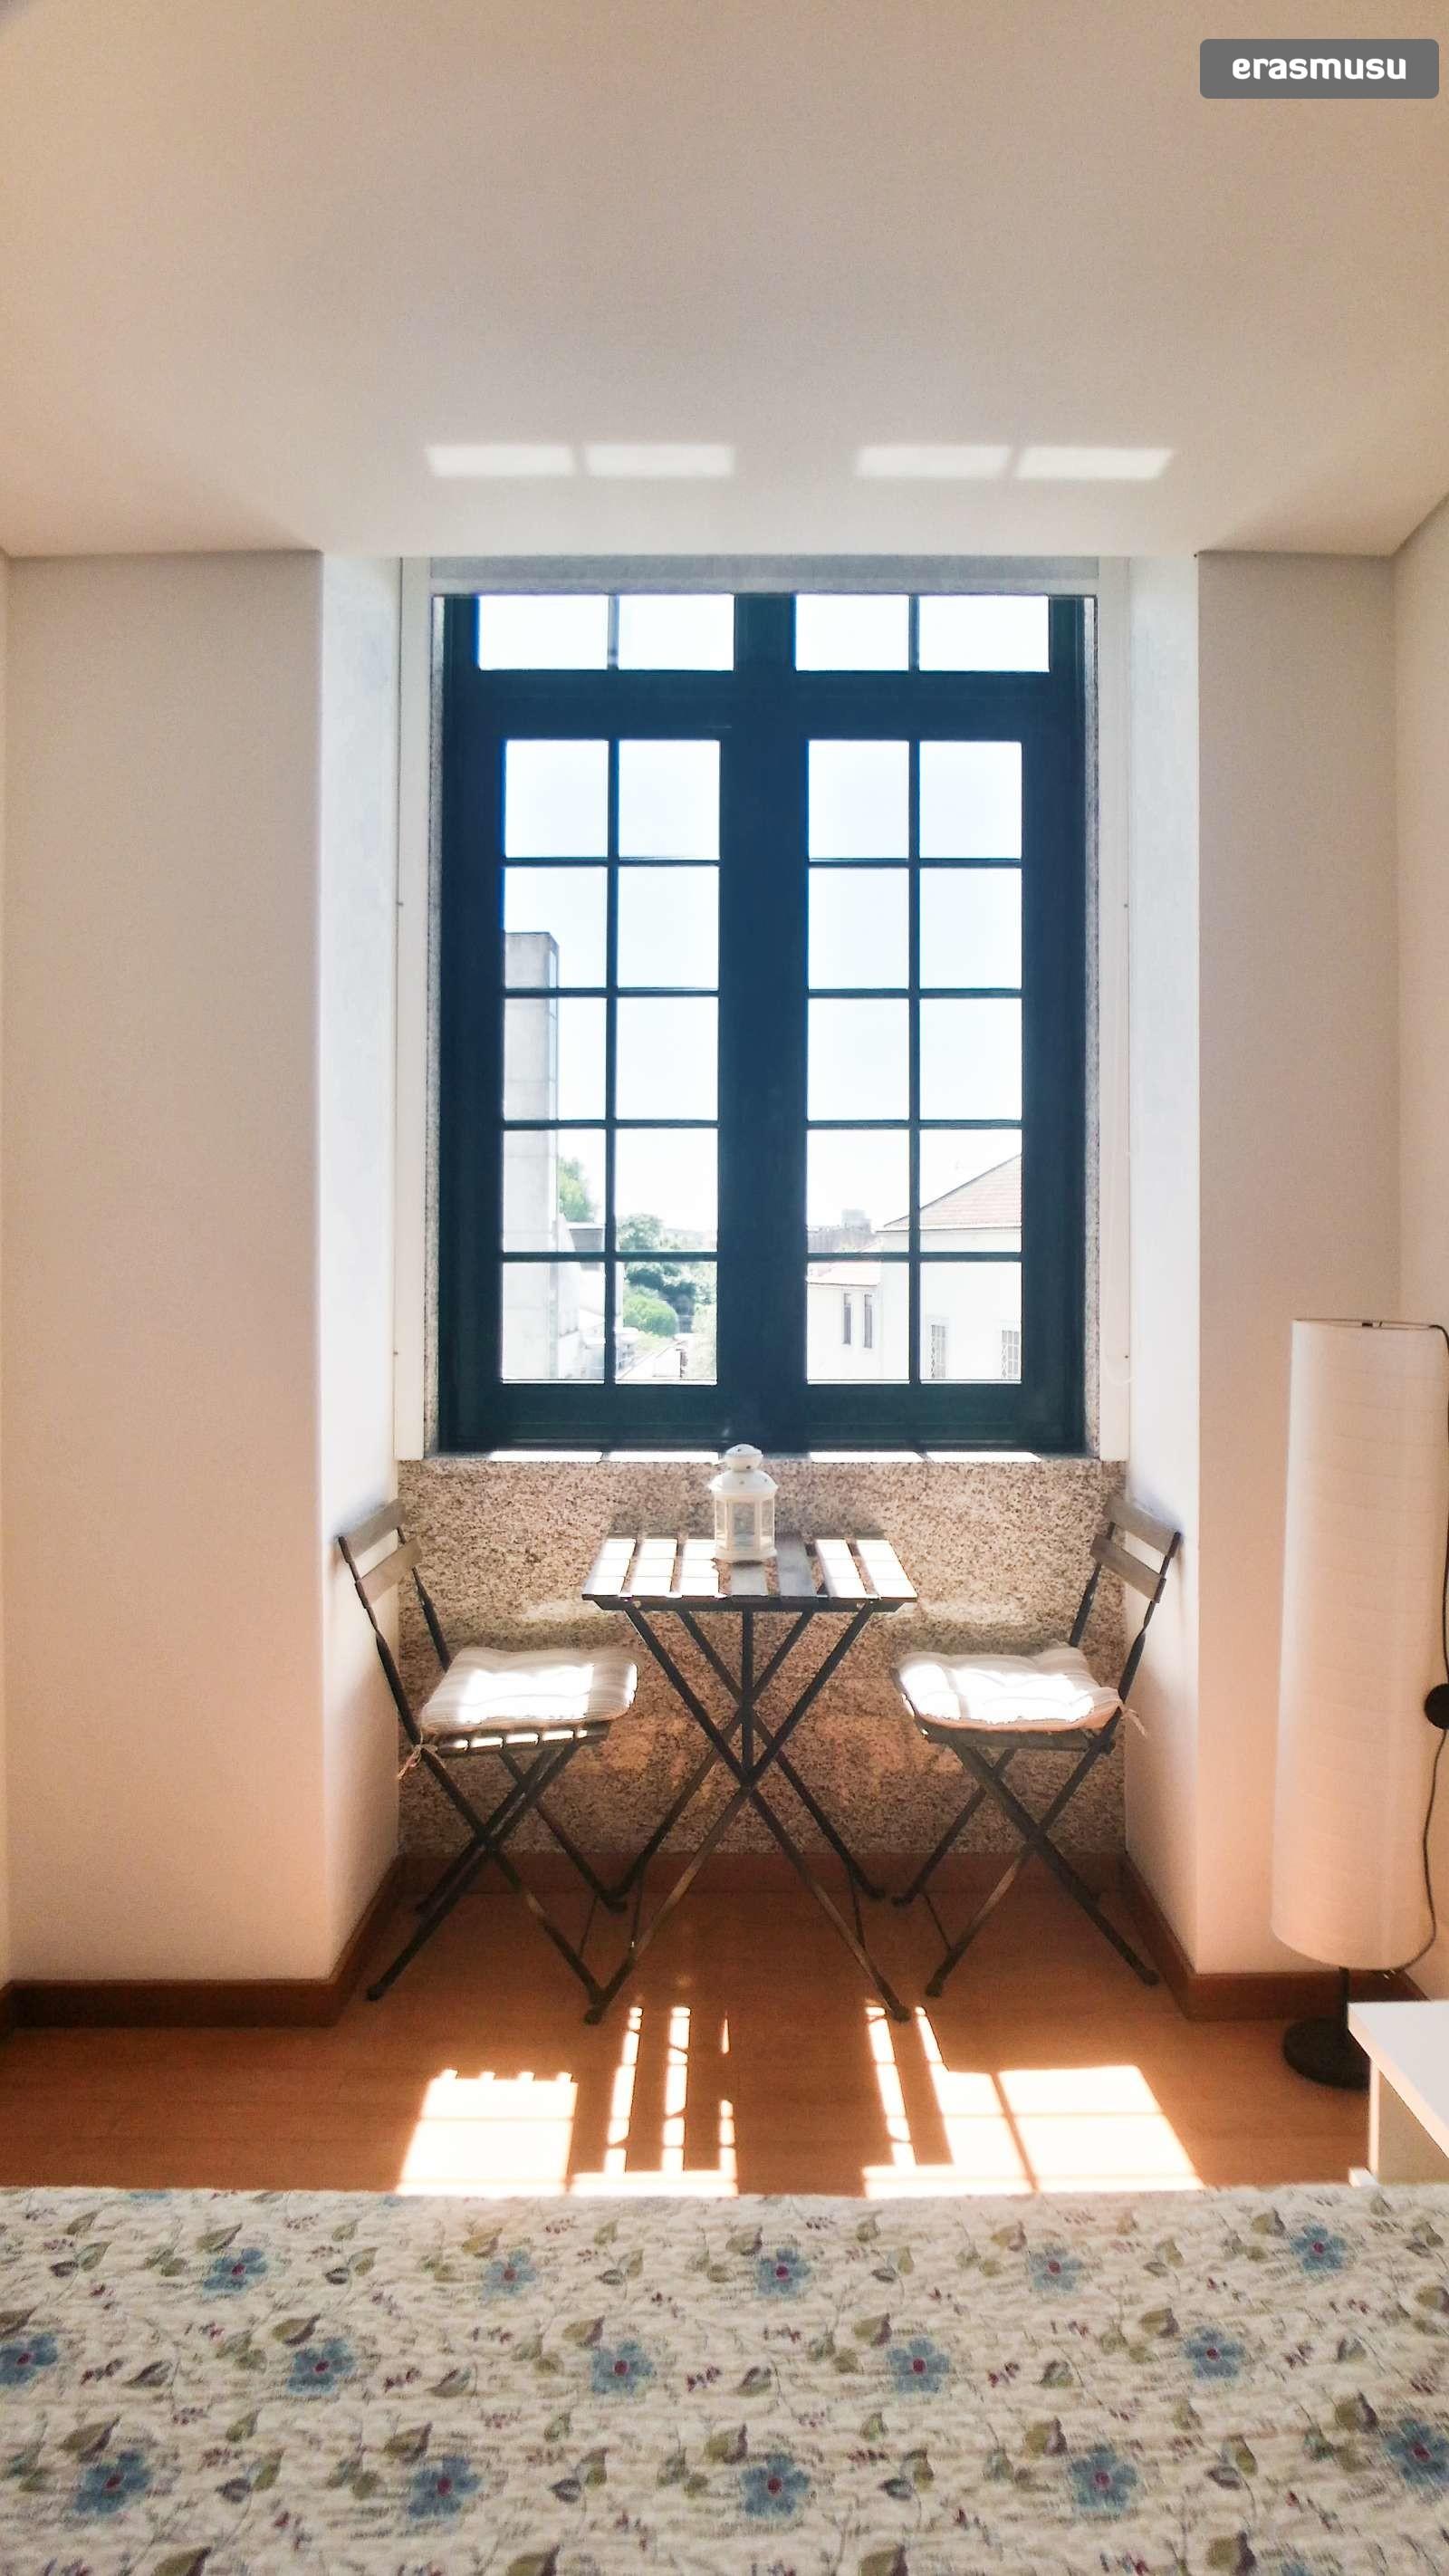 bright-studio-apartment-rent-cedofeita-dc014404a9c0bbbe5d7dd4efb